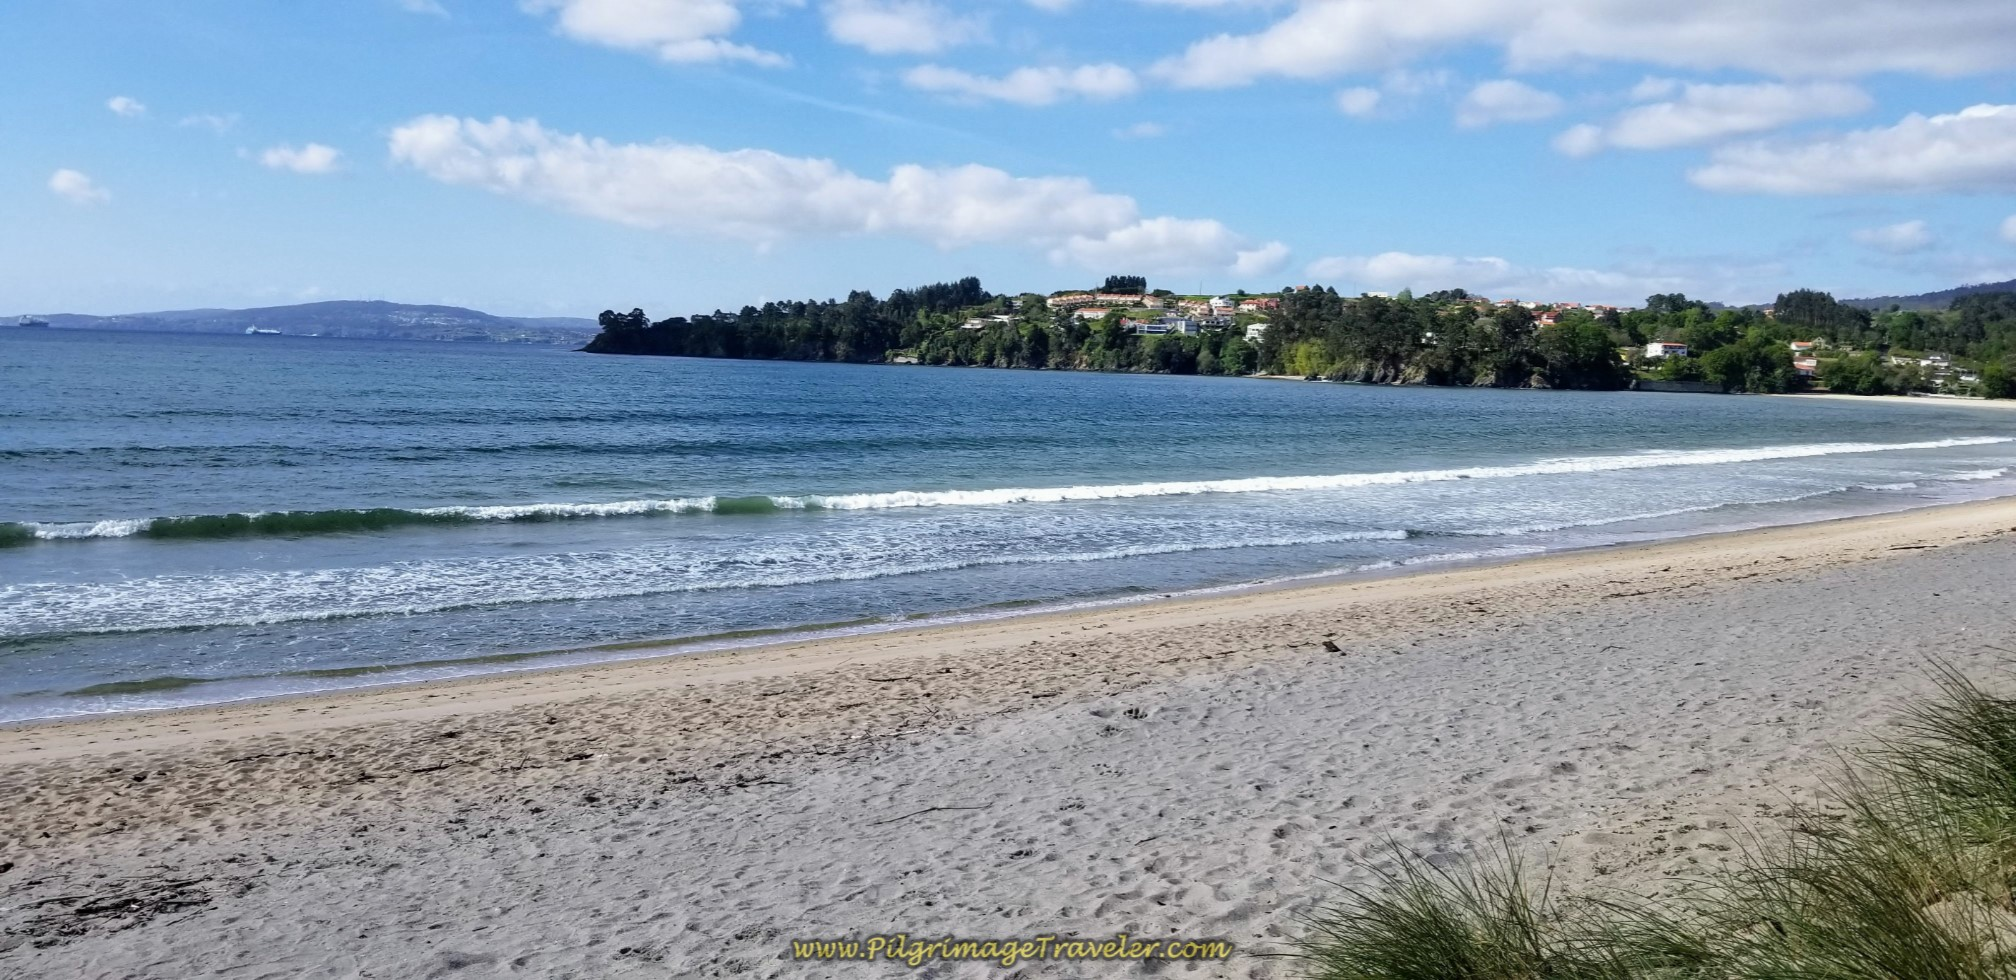 Praia Grande de Miño on day three of the English Way